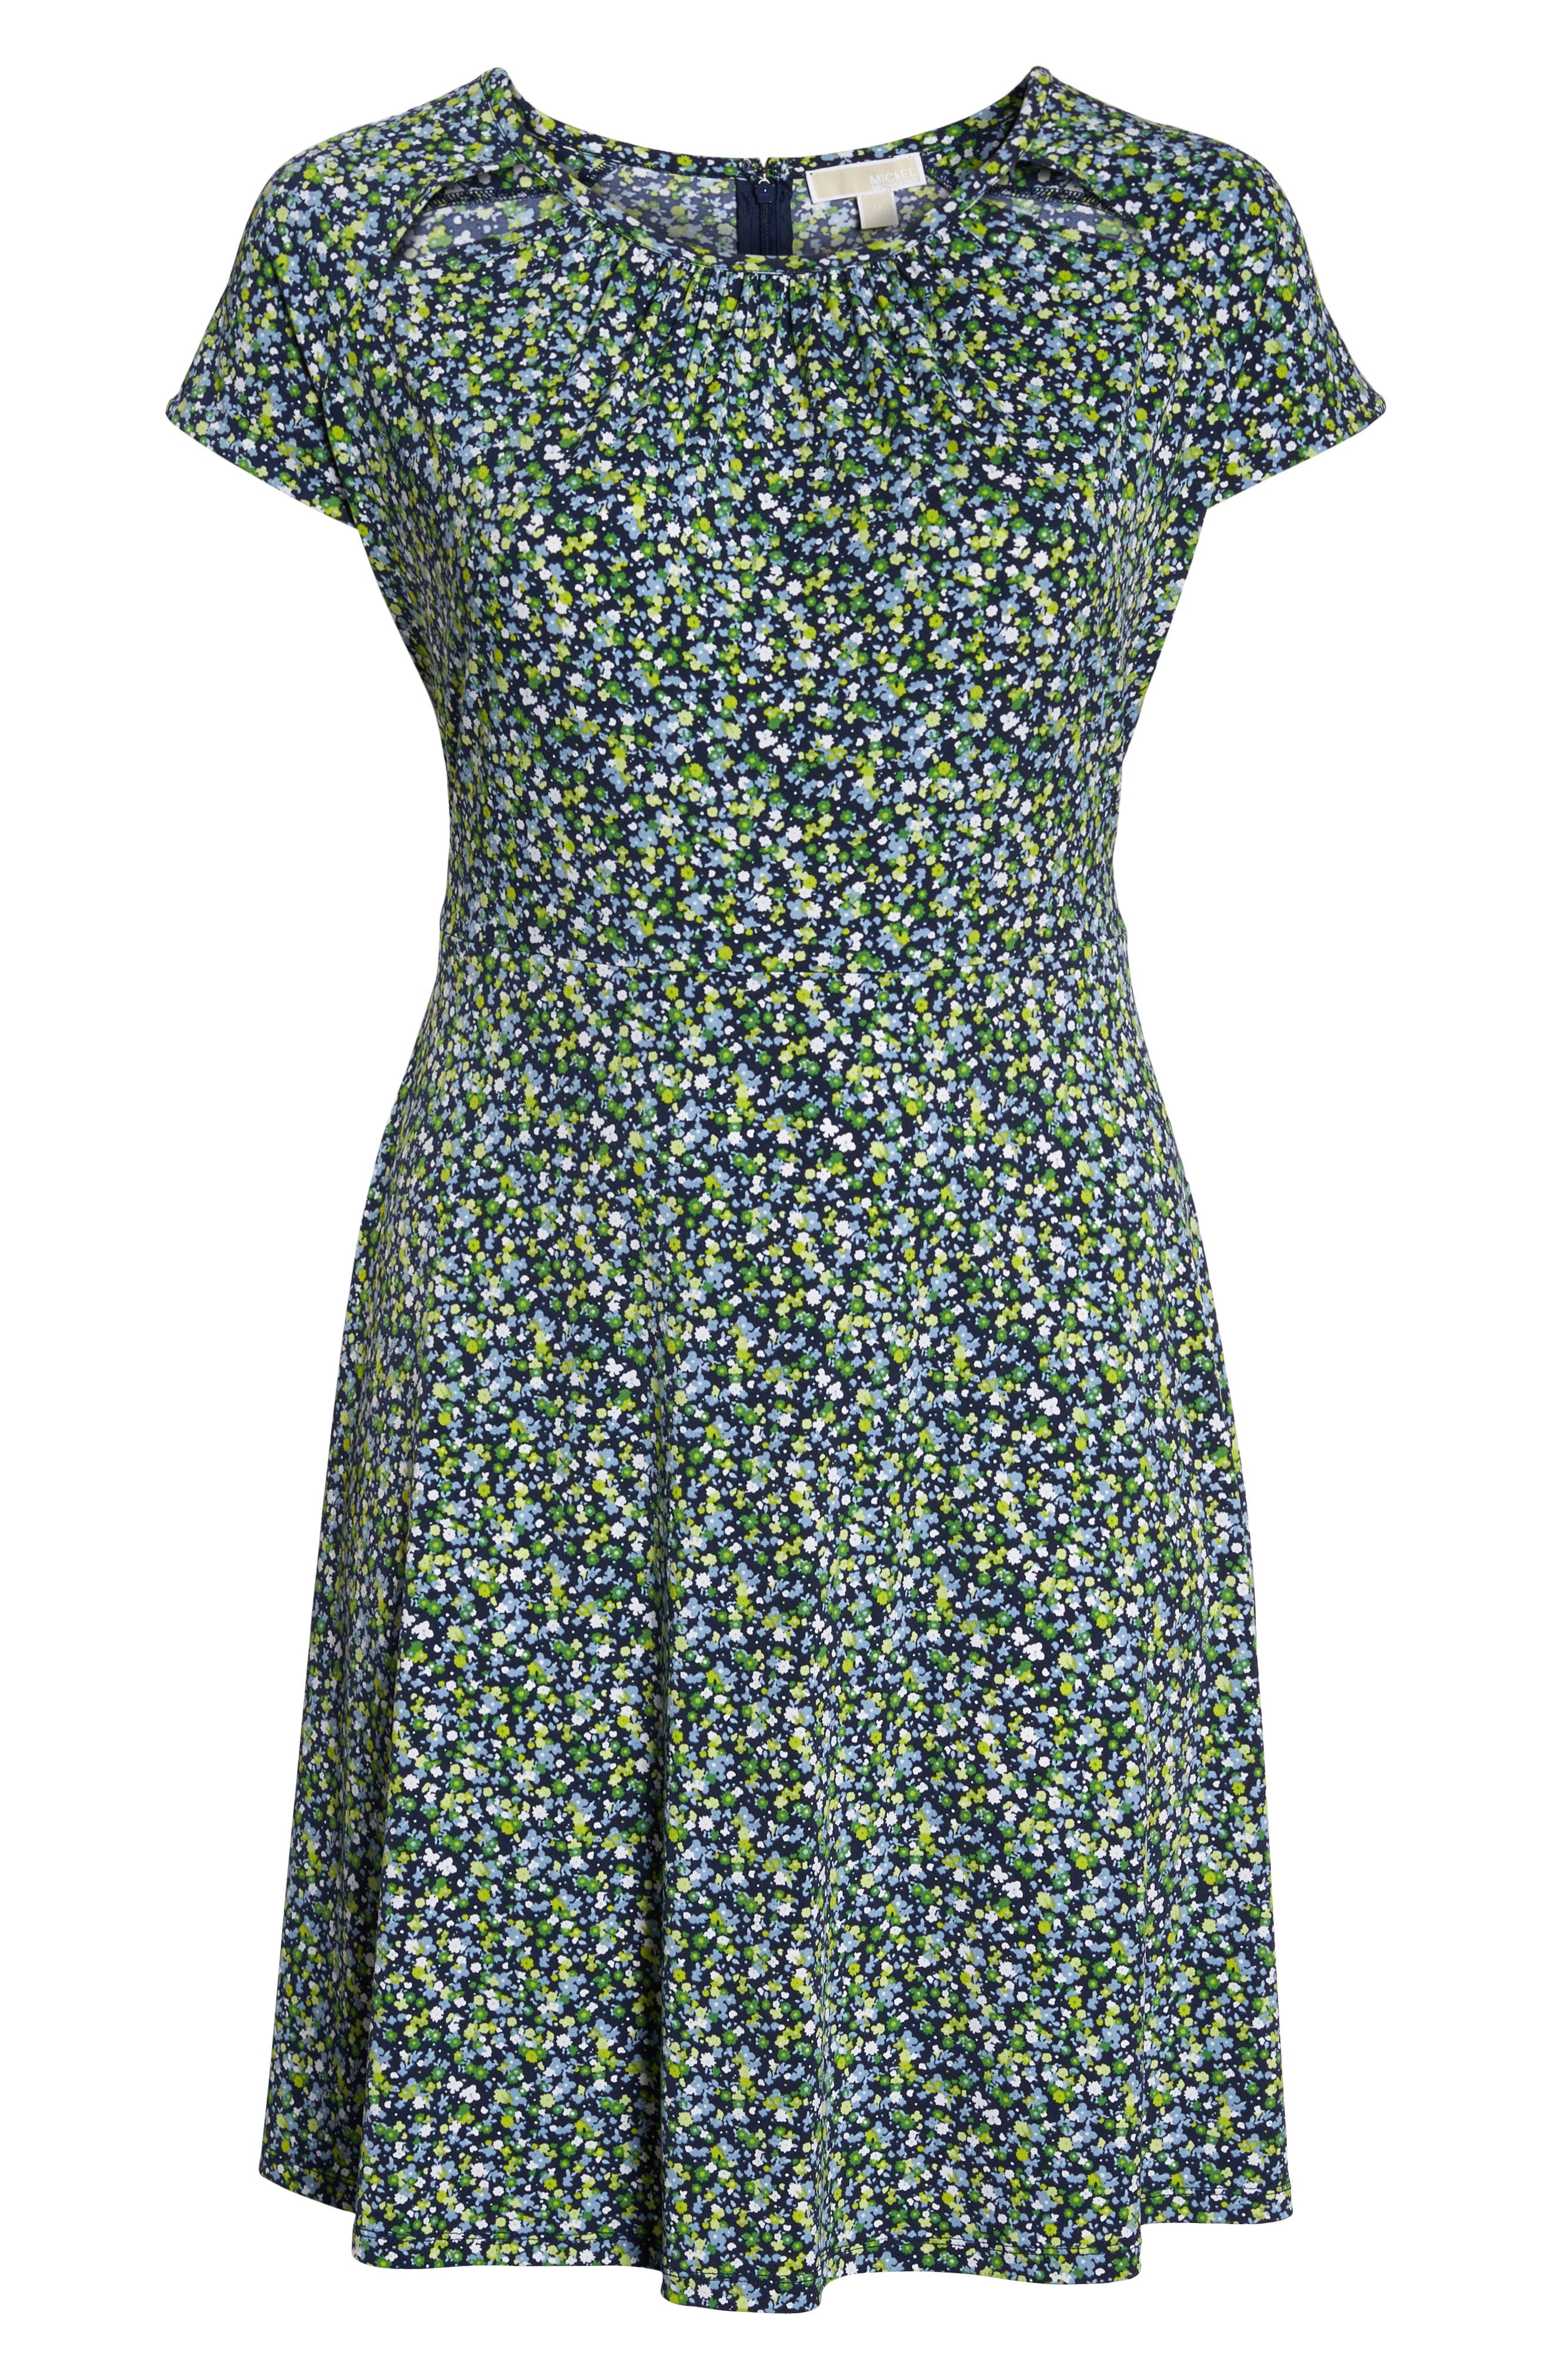 Floral Cutout Jersey Fit & Flare Dress,                             Alternate thumbnail 6, color,                             462